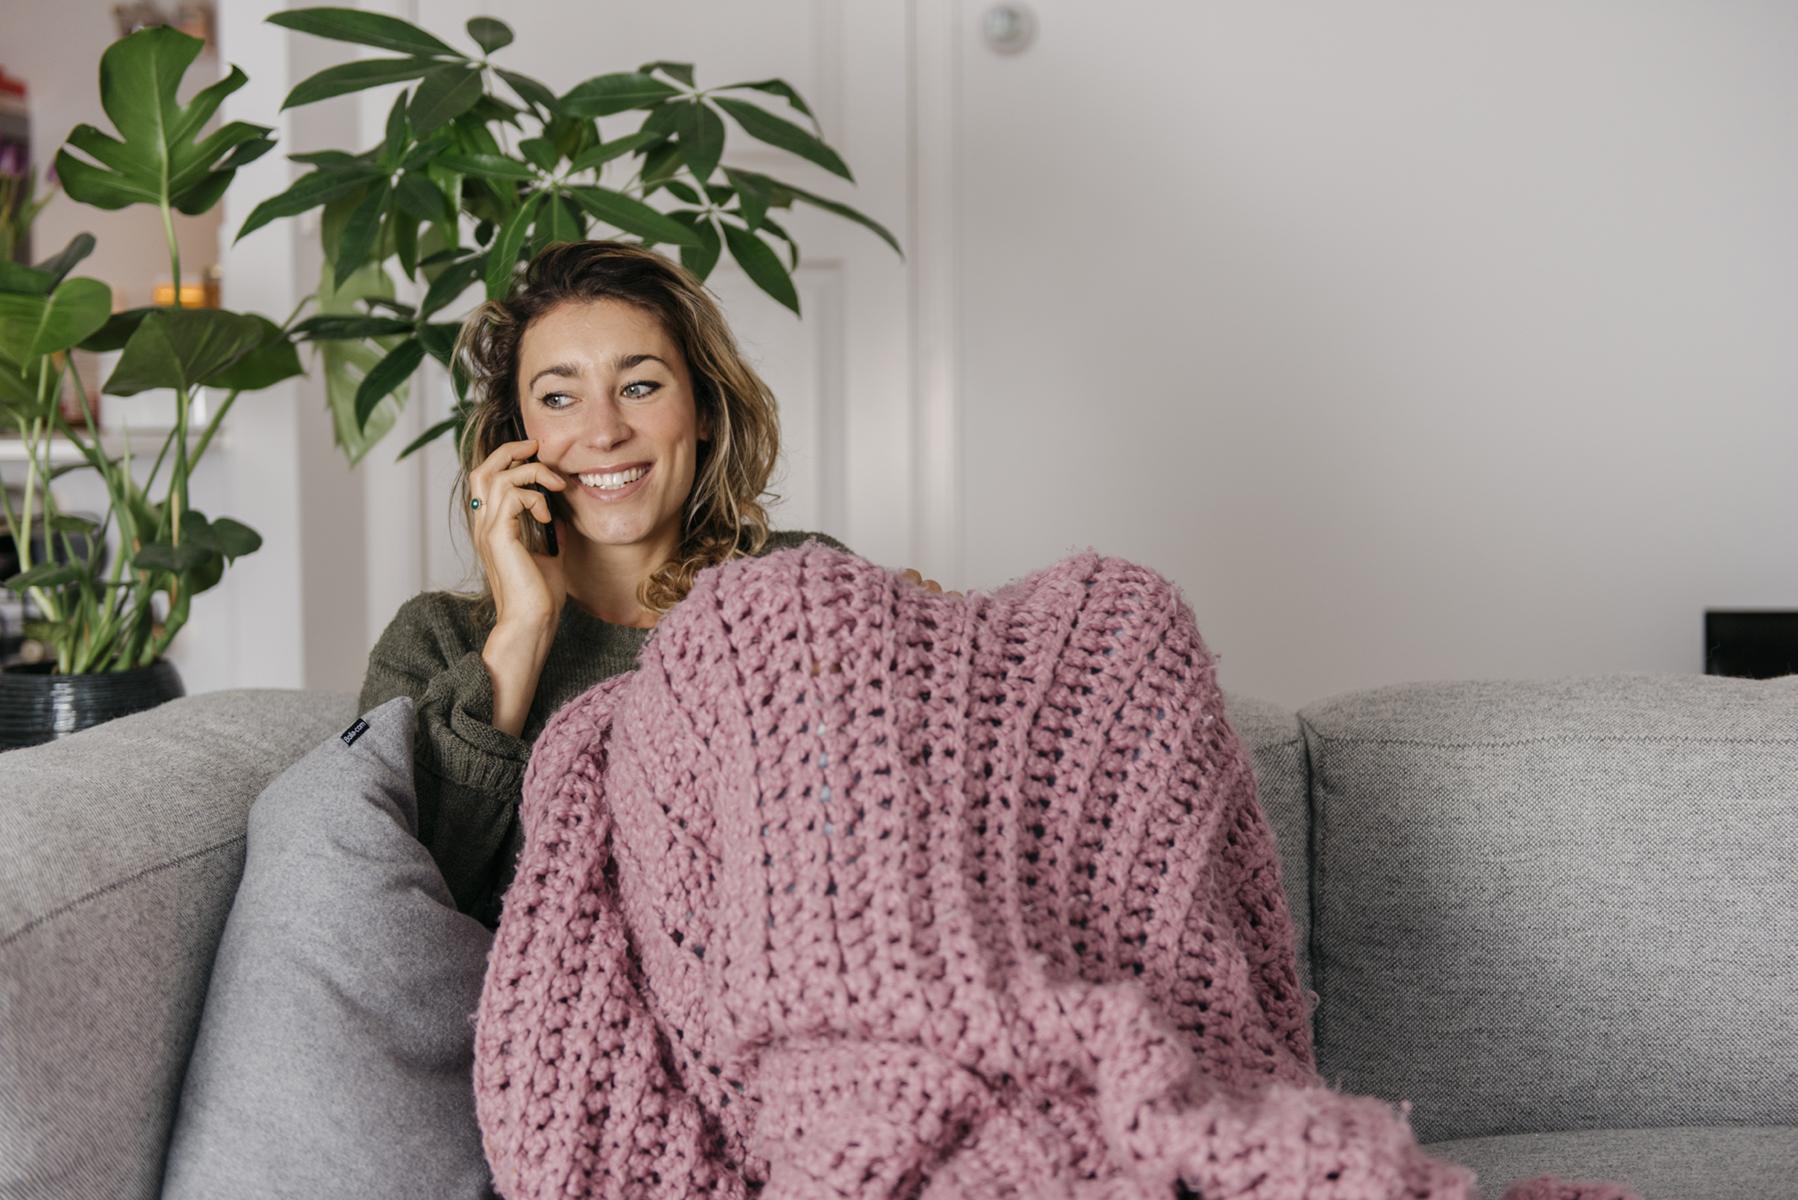 Draag jij vrijdag een warme trui?